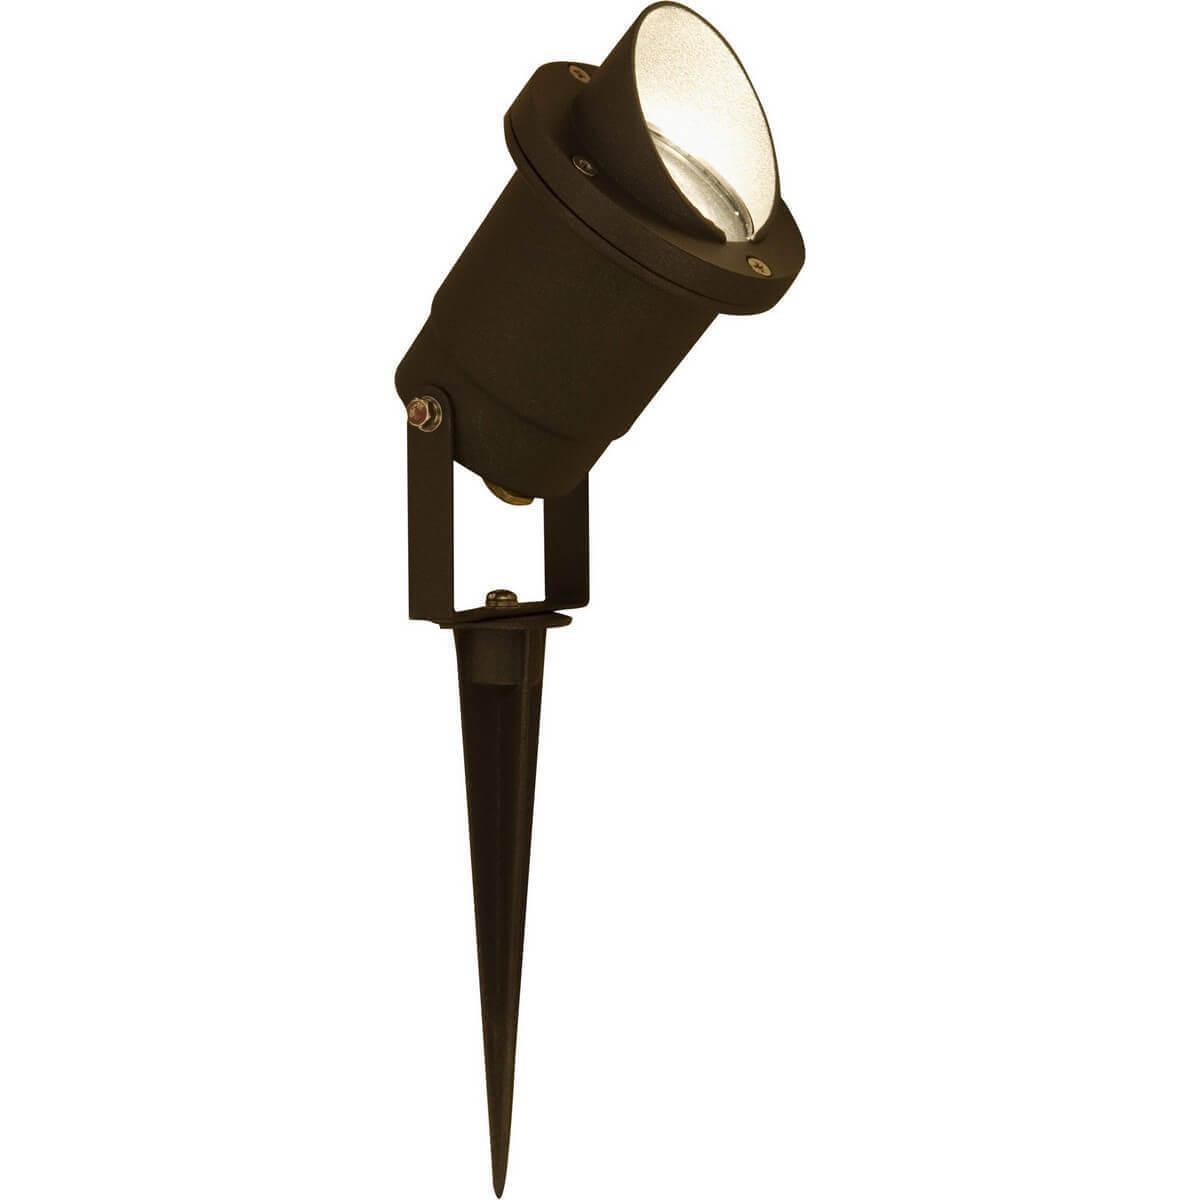 Ландшафтный светильник Nowodvorski Bush 3401